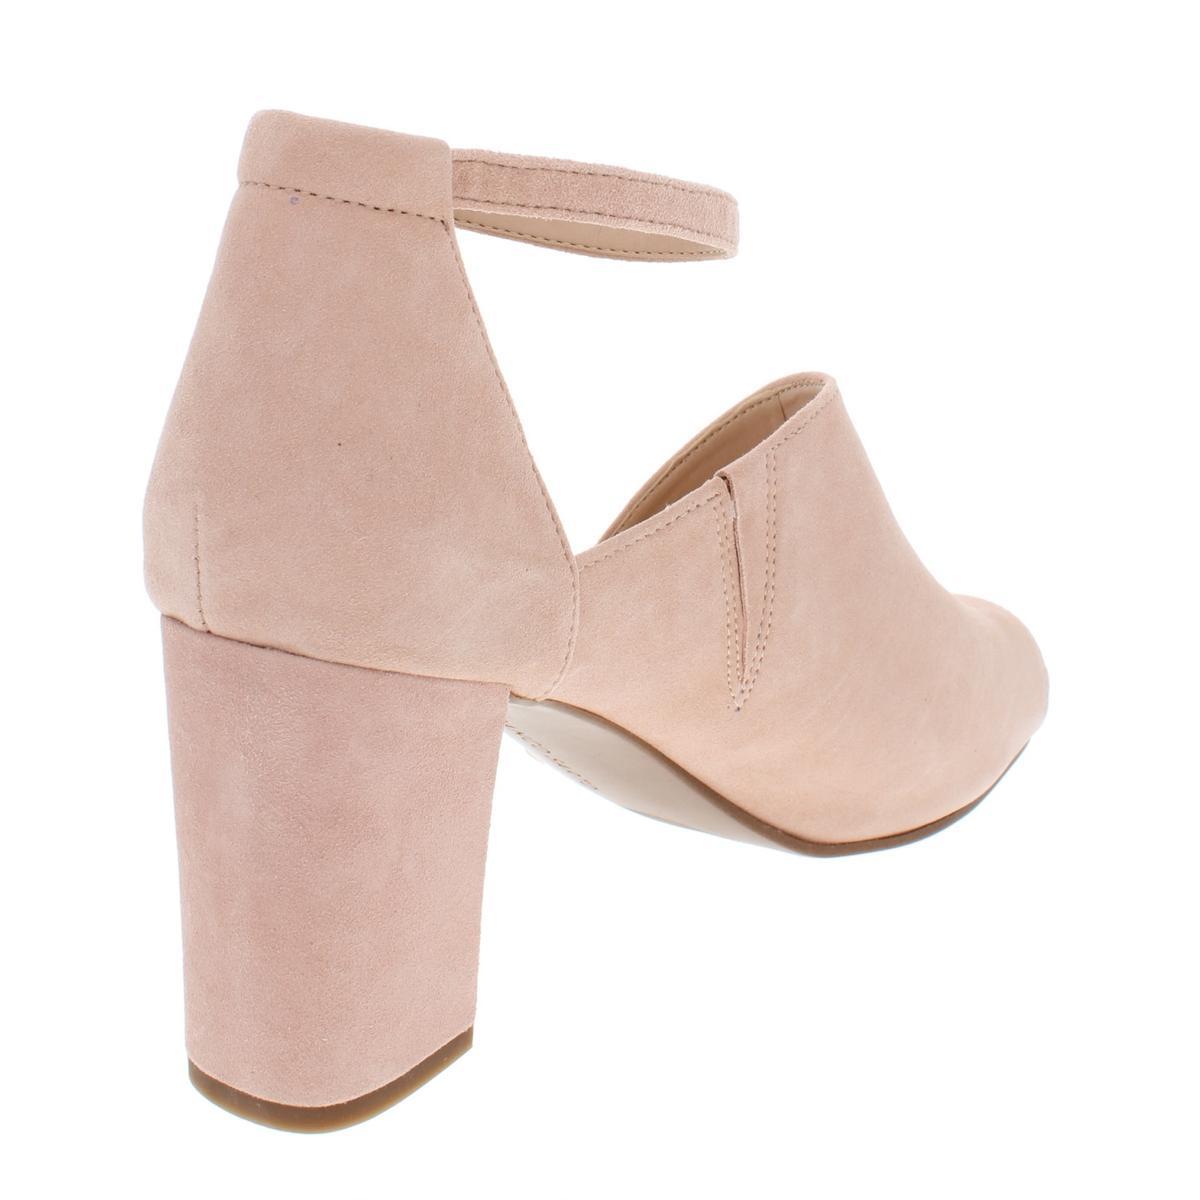 Franco-Sarto-Womens-Gayle-Suede-Block-Heel-Dress-Sandals-Shoes-BHFO-5369 thumbnail 4